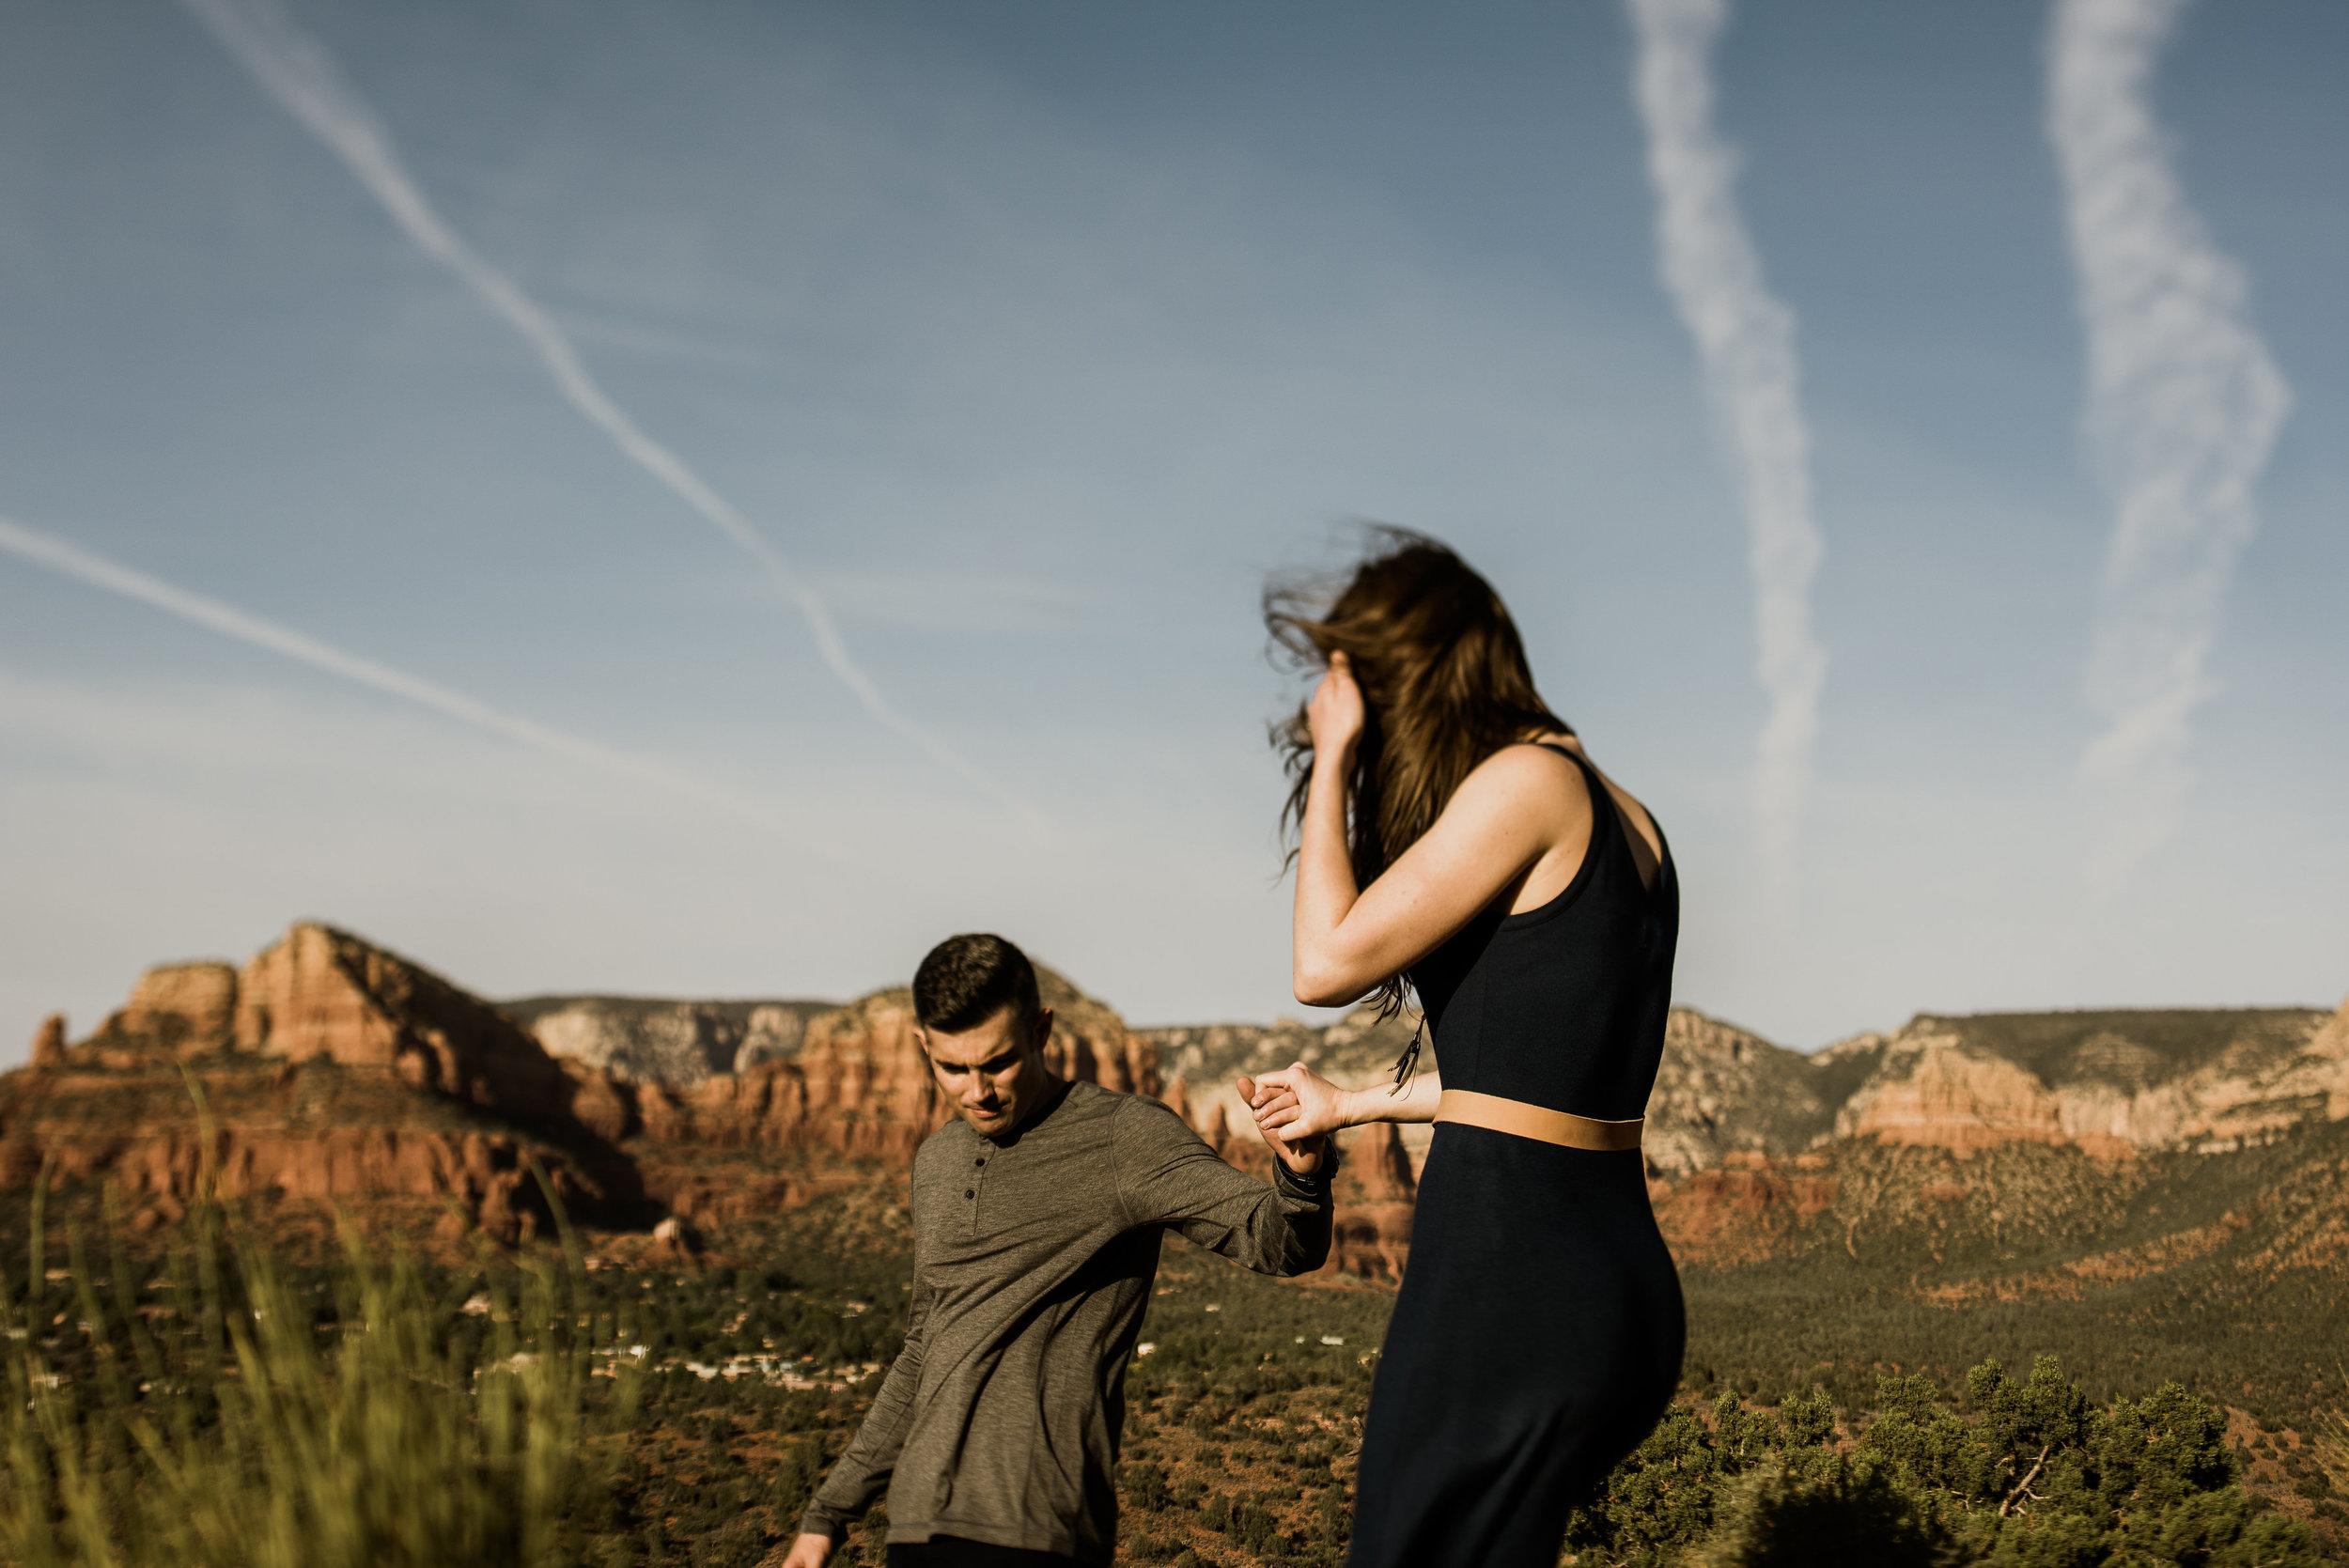 Isaiah-&-Taylor-Photography---Paul-&-Karen-Engagement,-Sedona-Arizona-048.jpg